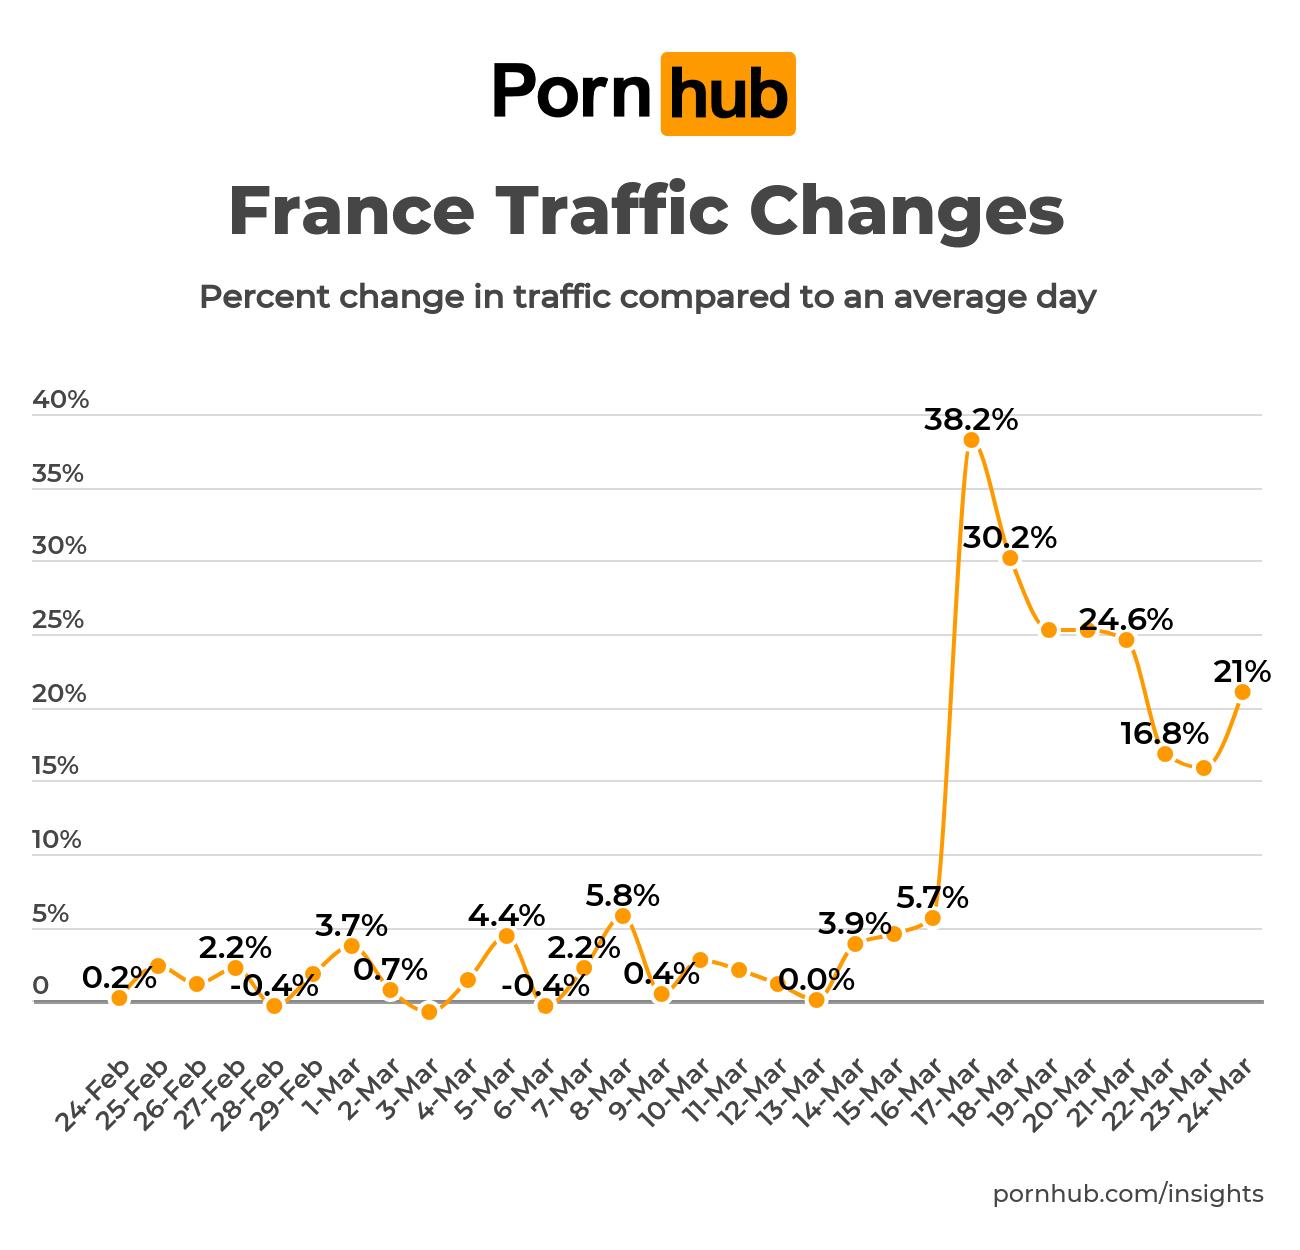 pornhub-insights-coronavirus-trafic-france